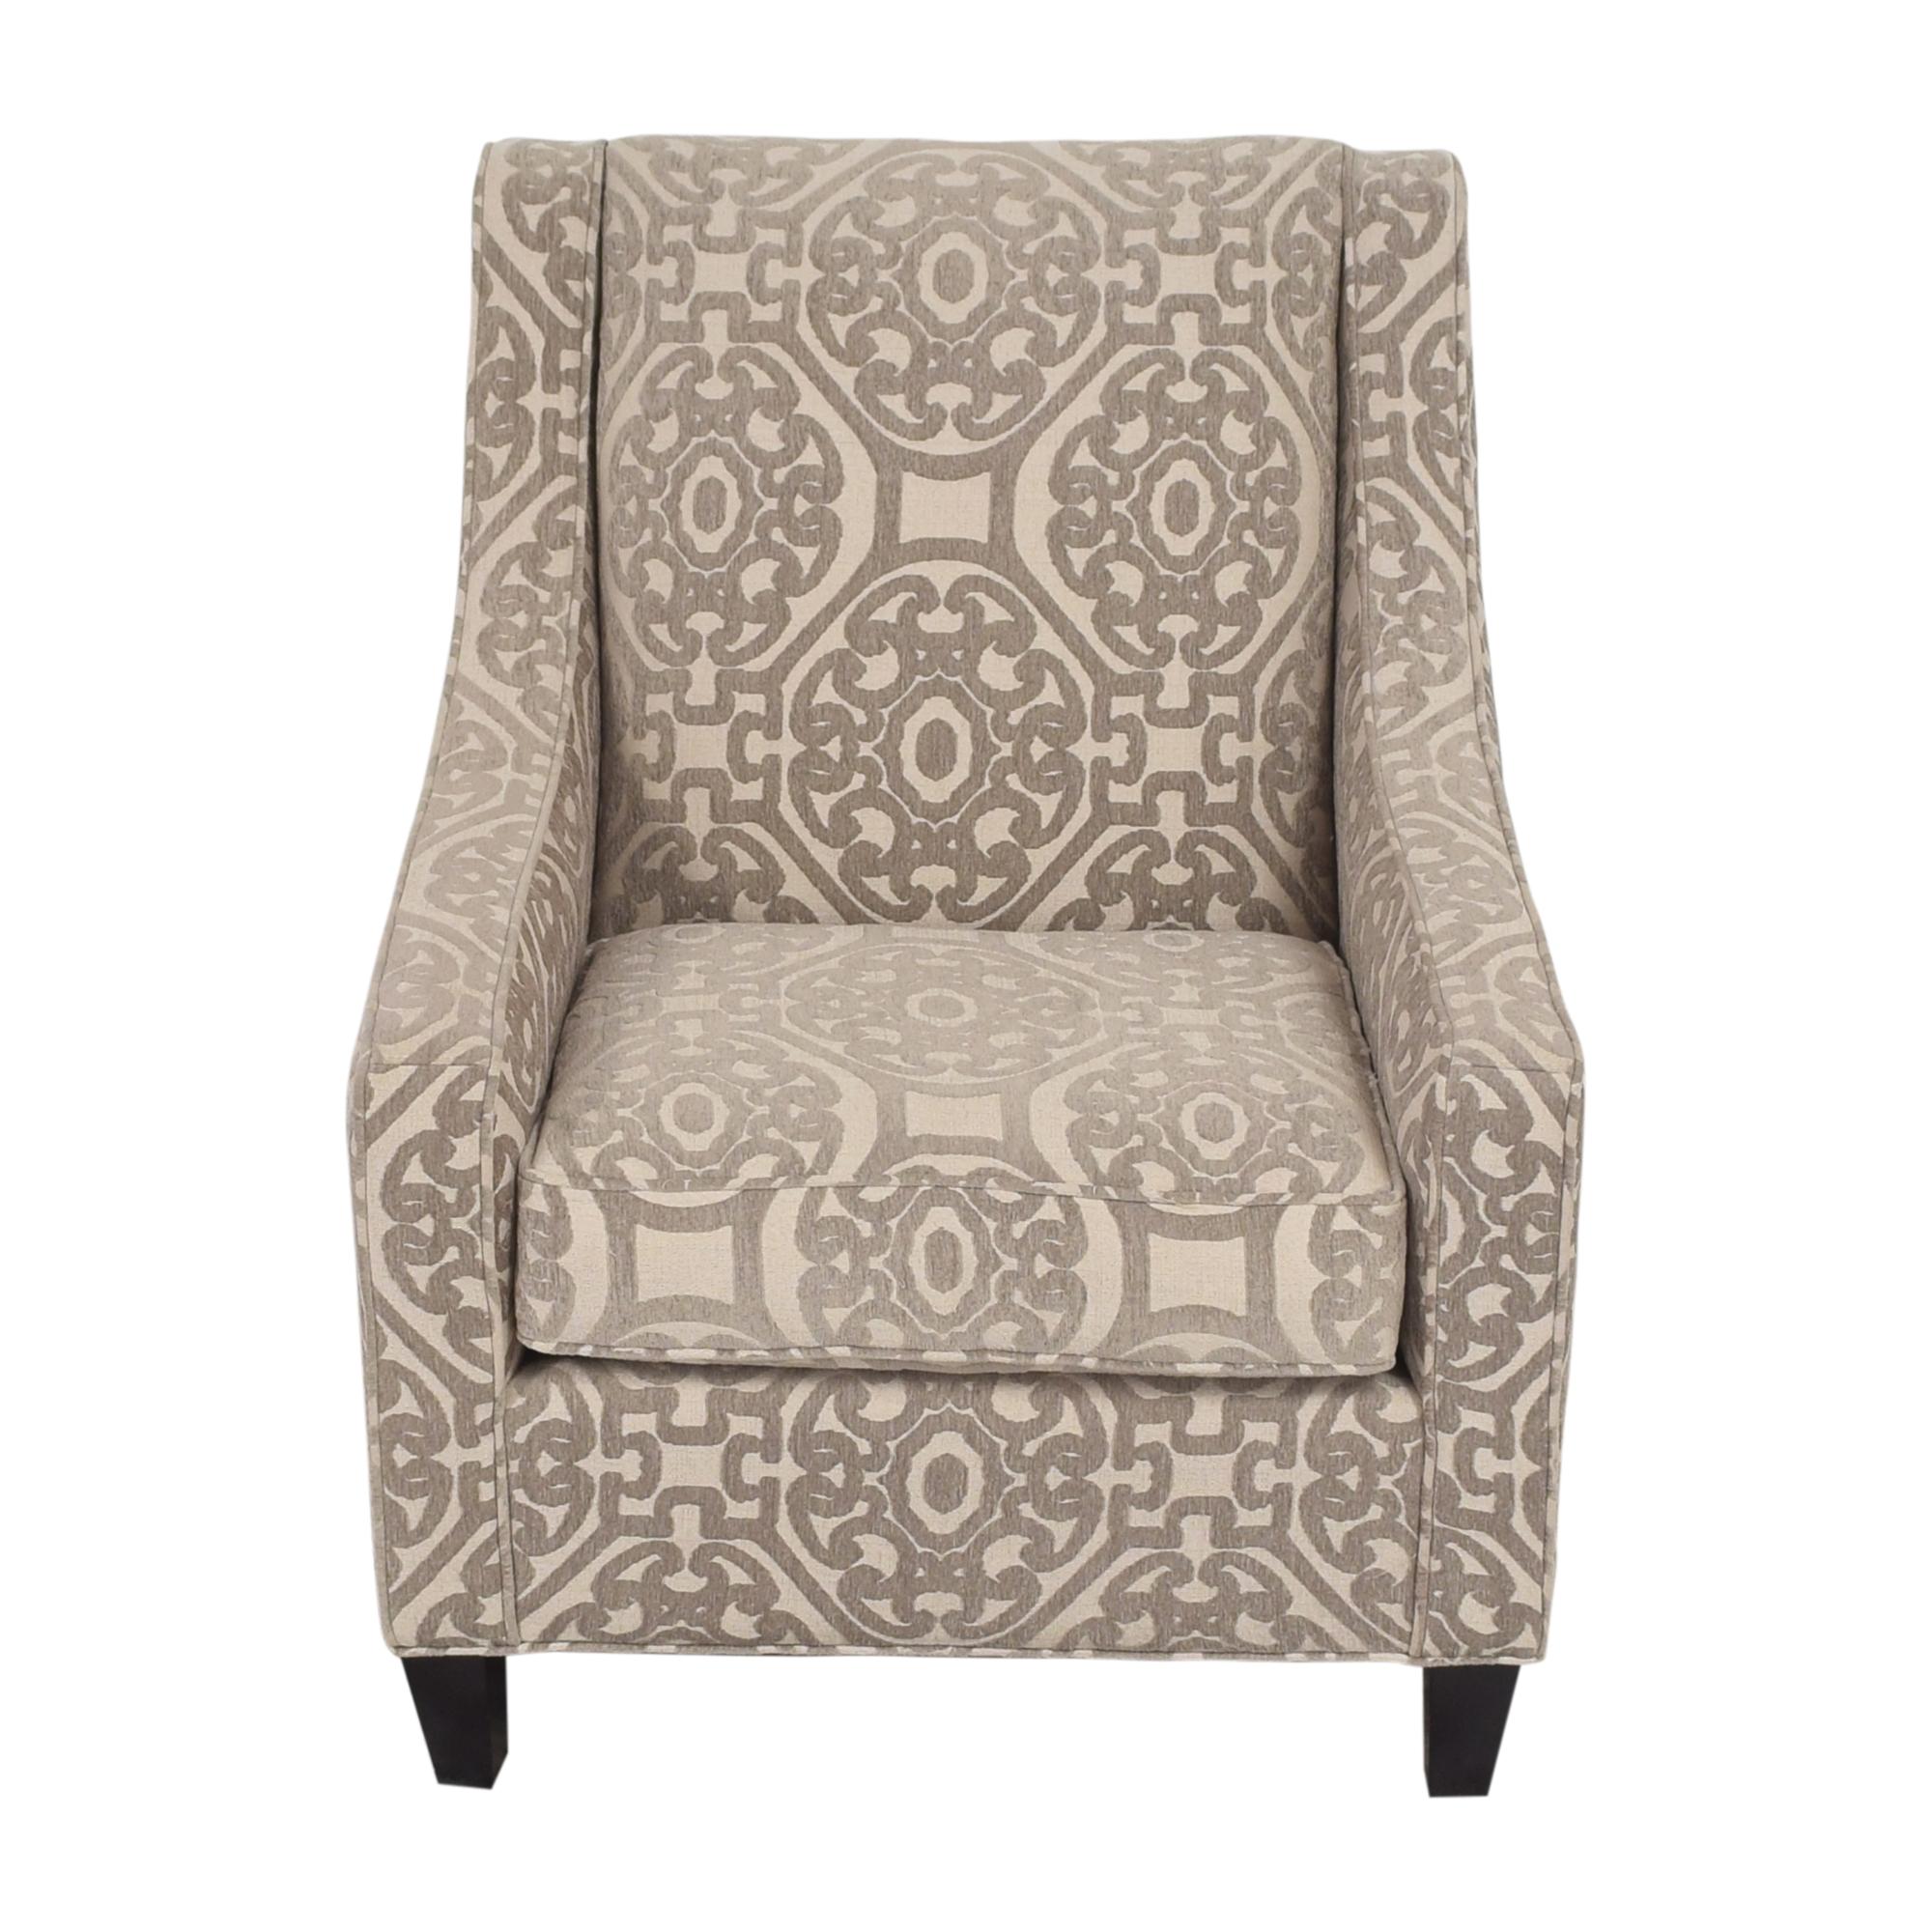 shop Raymour & Flanigan Raymour & Flanigan Cindy Crawford Home Calista Chair online